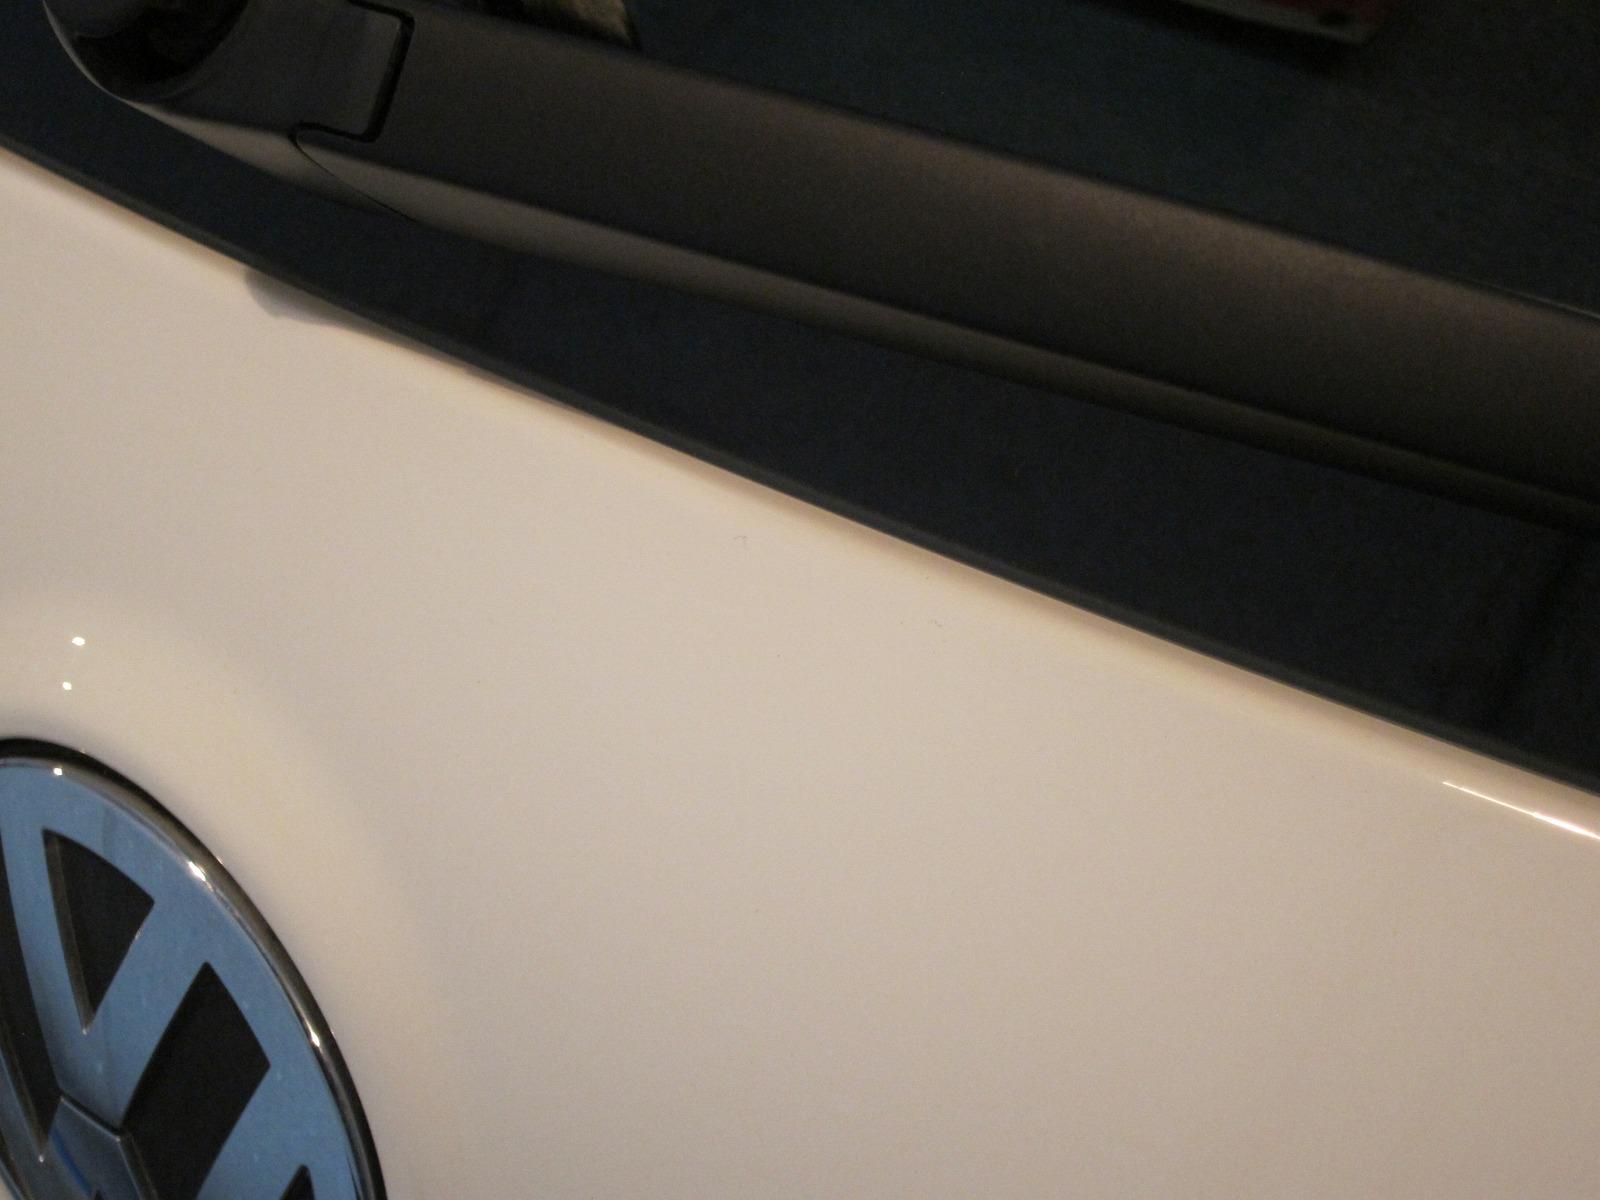 20150823-volkswagen-golf-gti-17